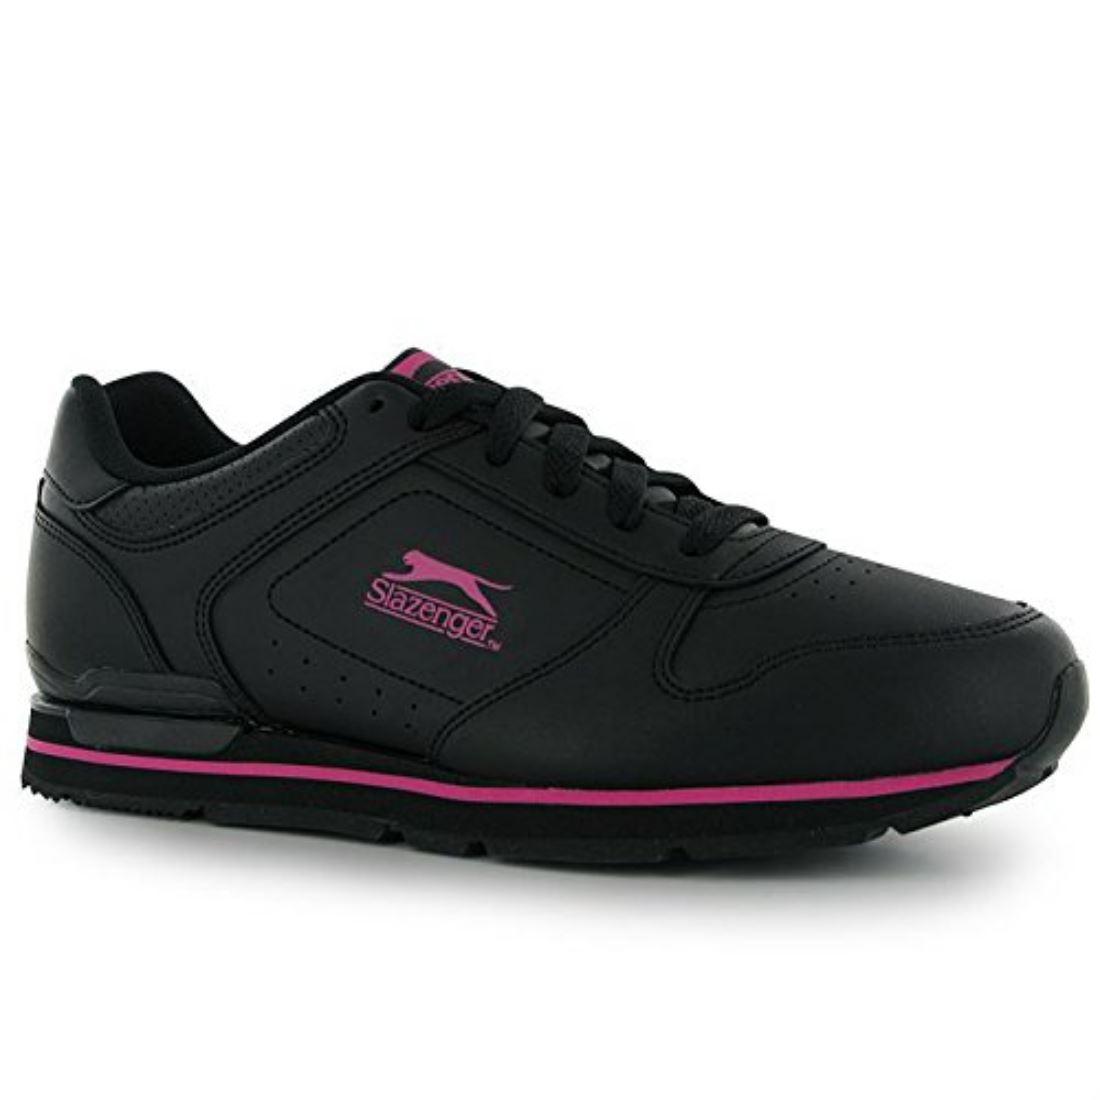 Slazenger Sports Shoes